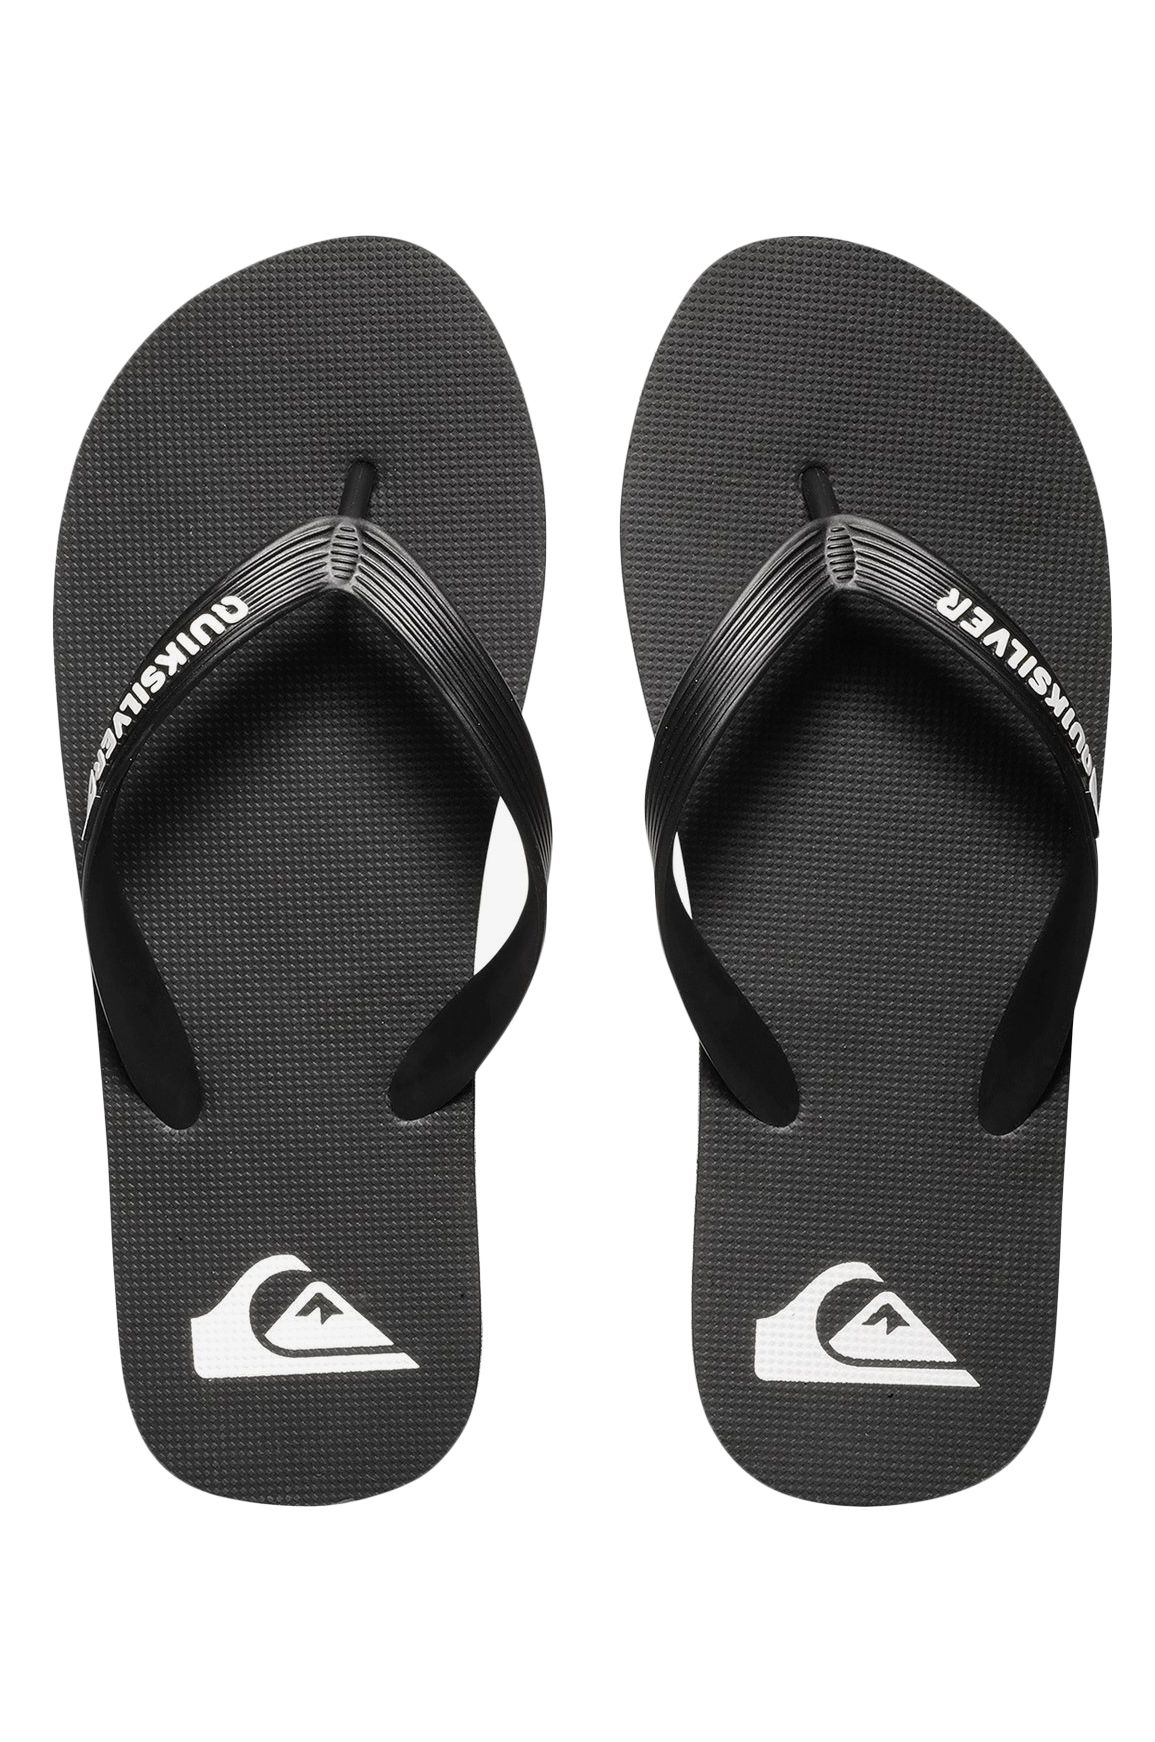 Quiksilver Sandals MOLOKAI Black/Black/White